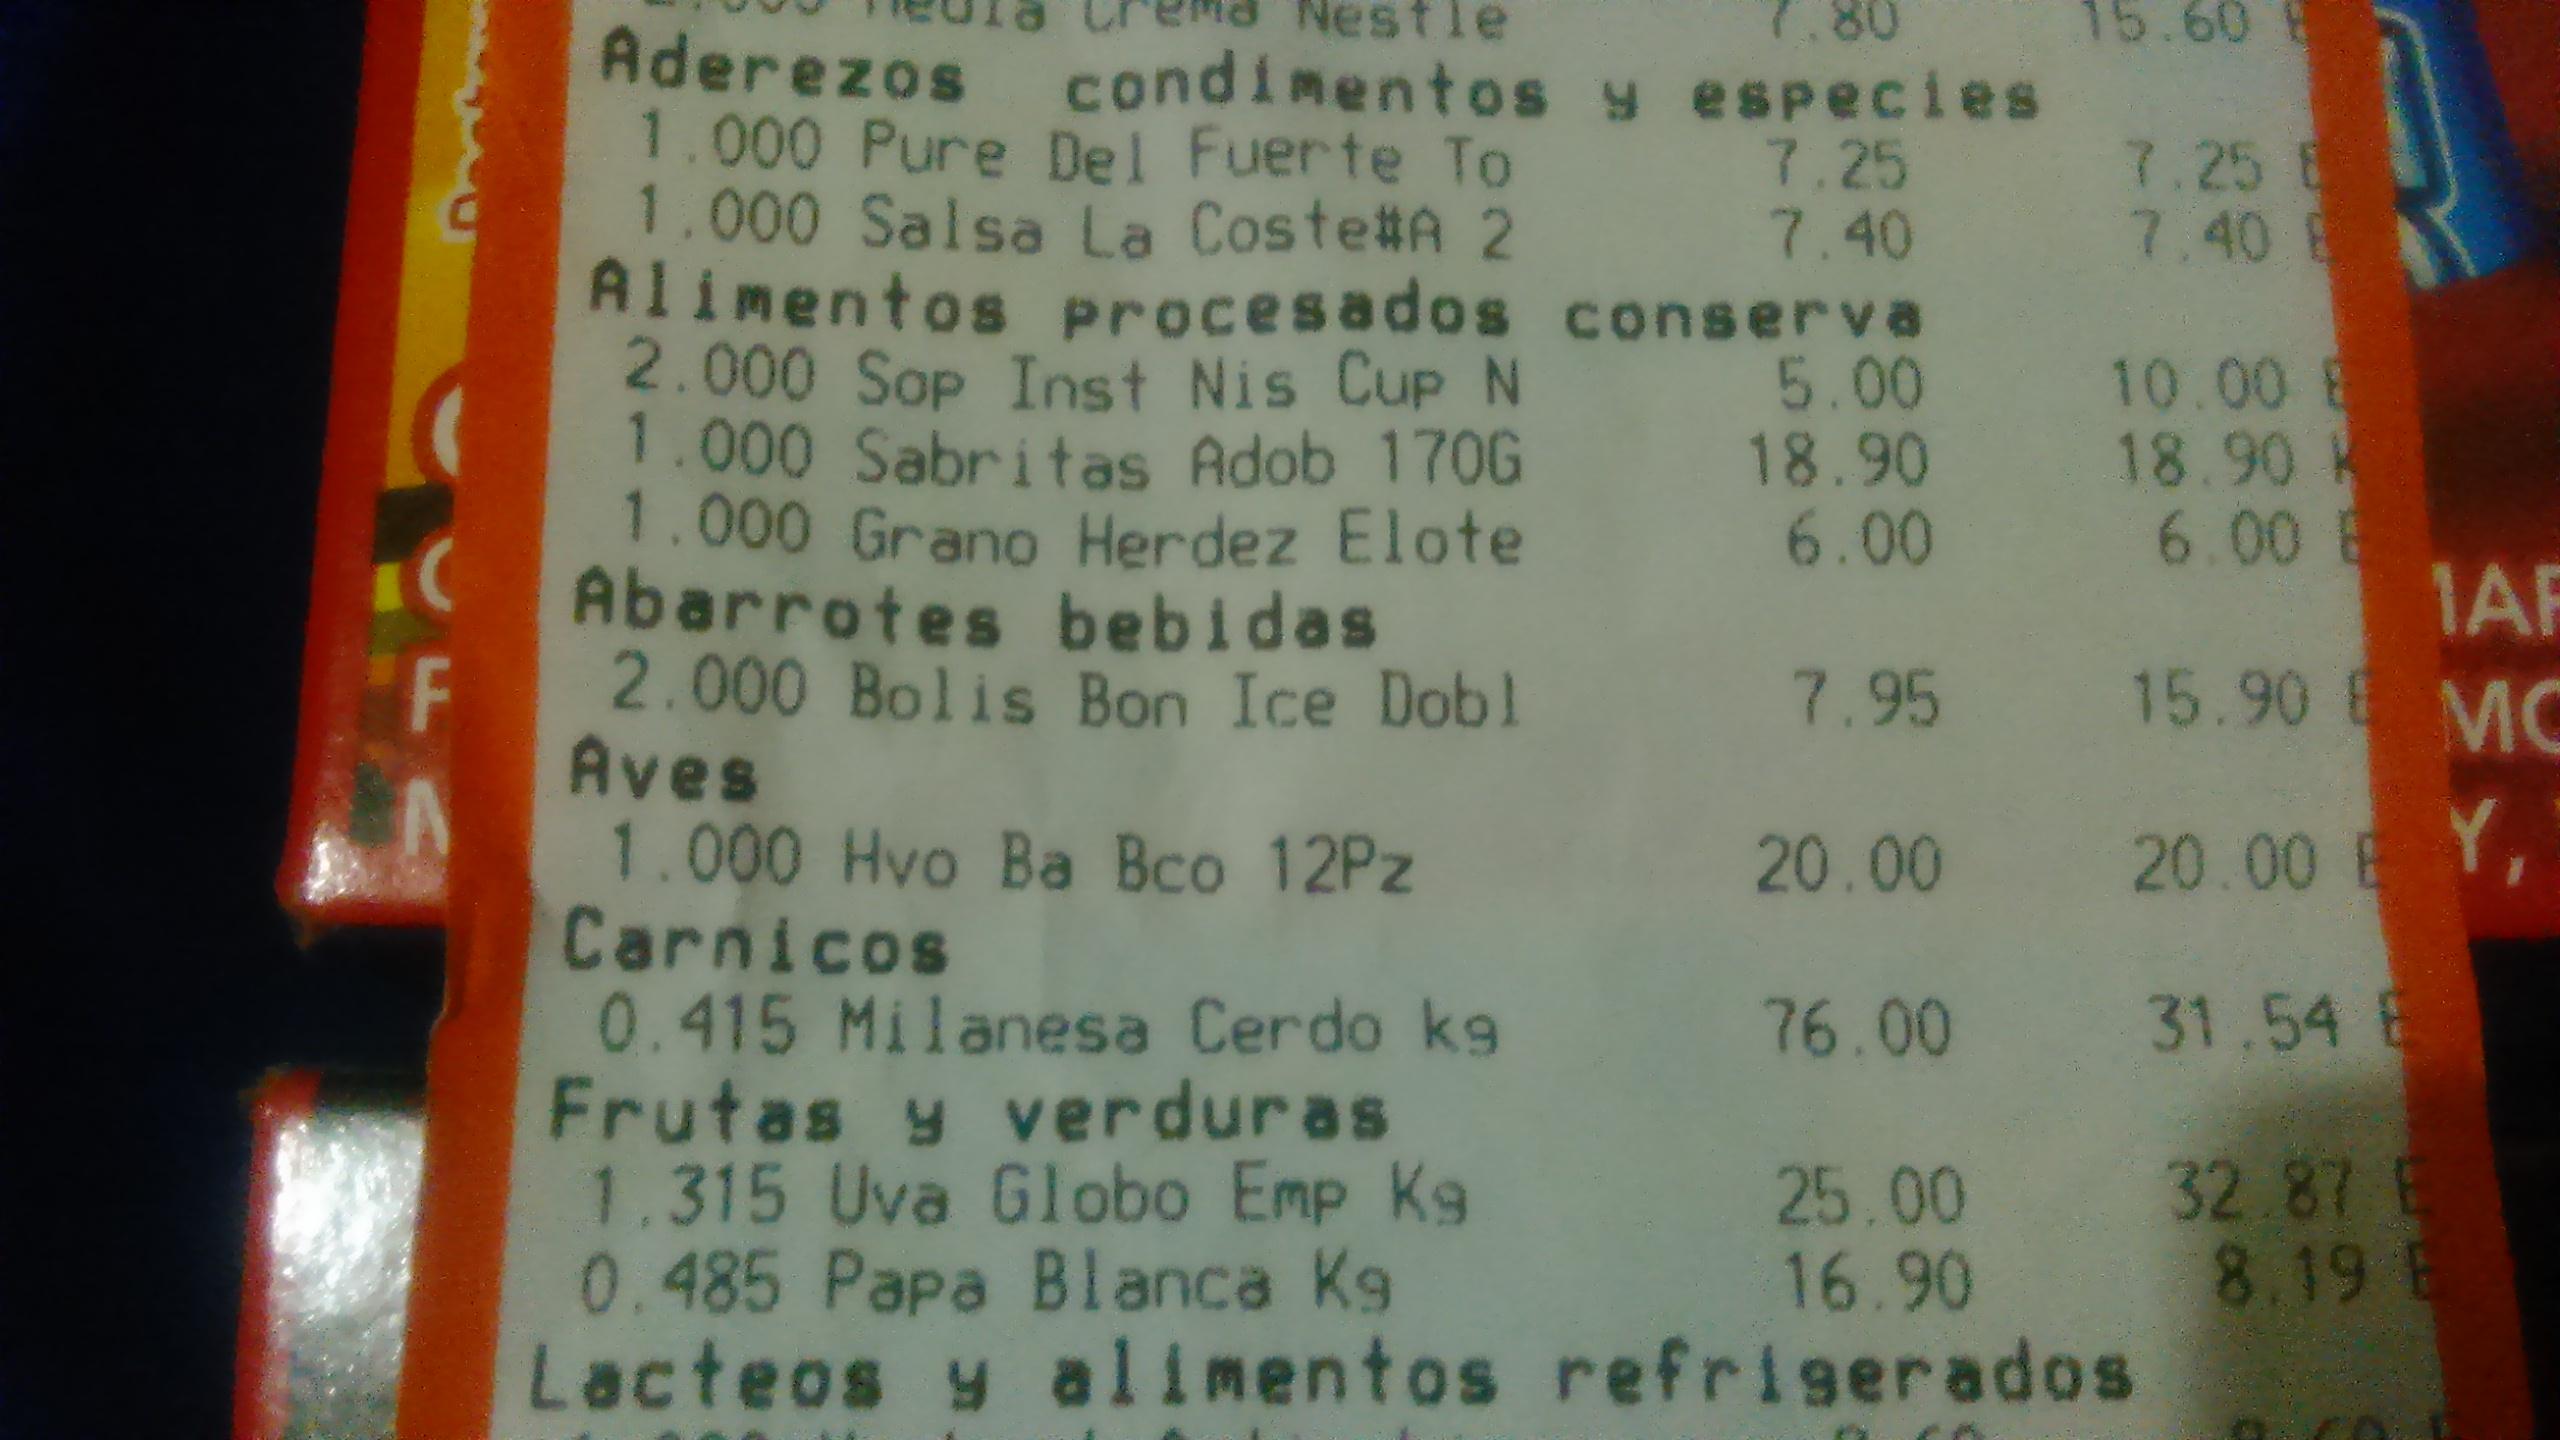 Chedraui mina villahermosa: BonIce 5 piezas a $7.95